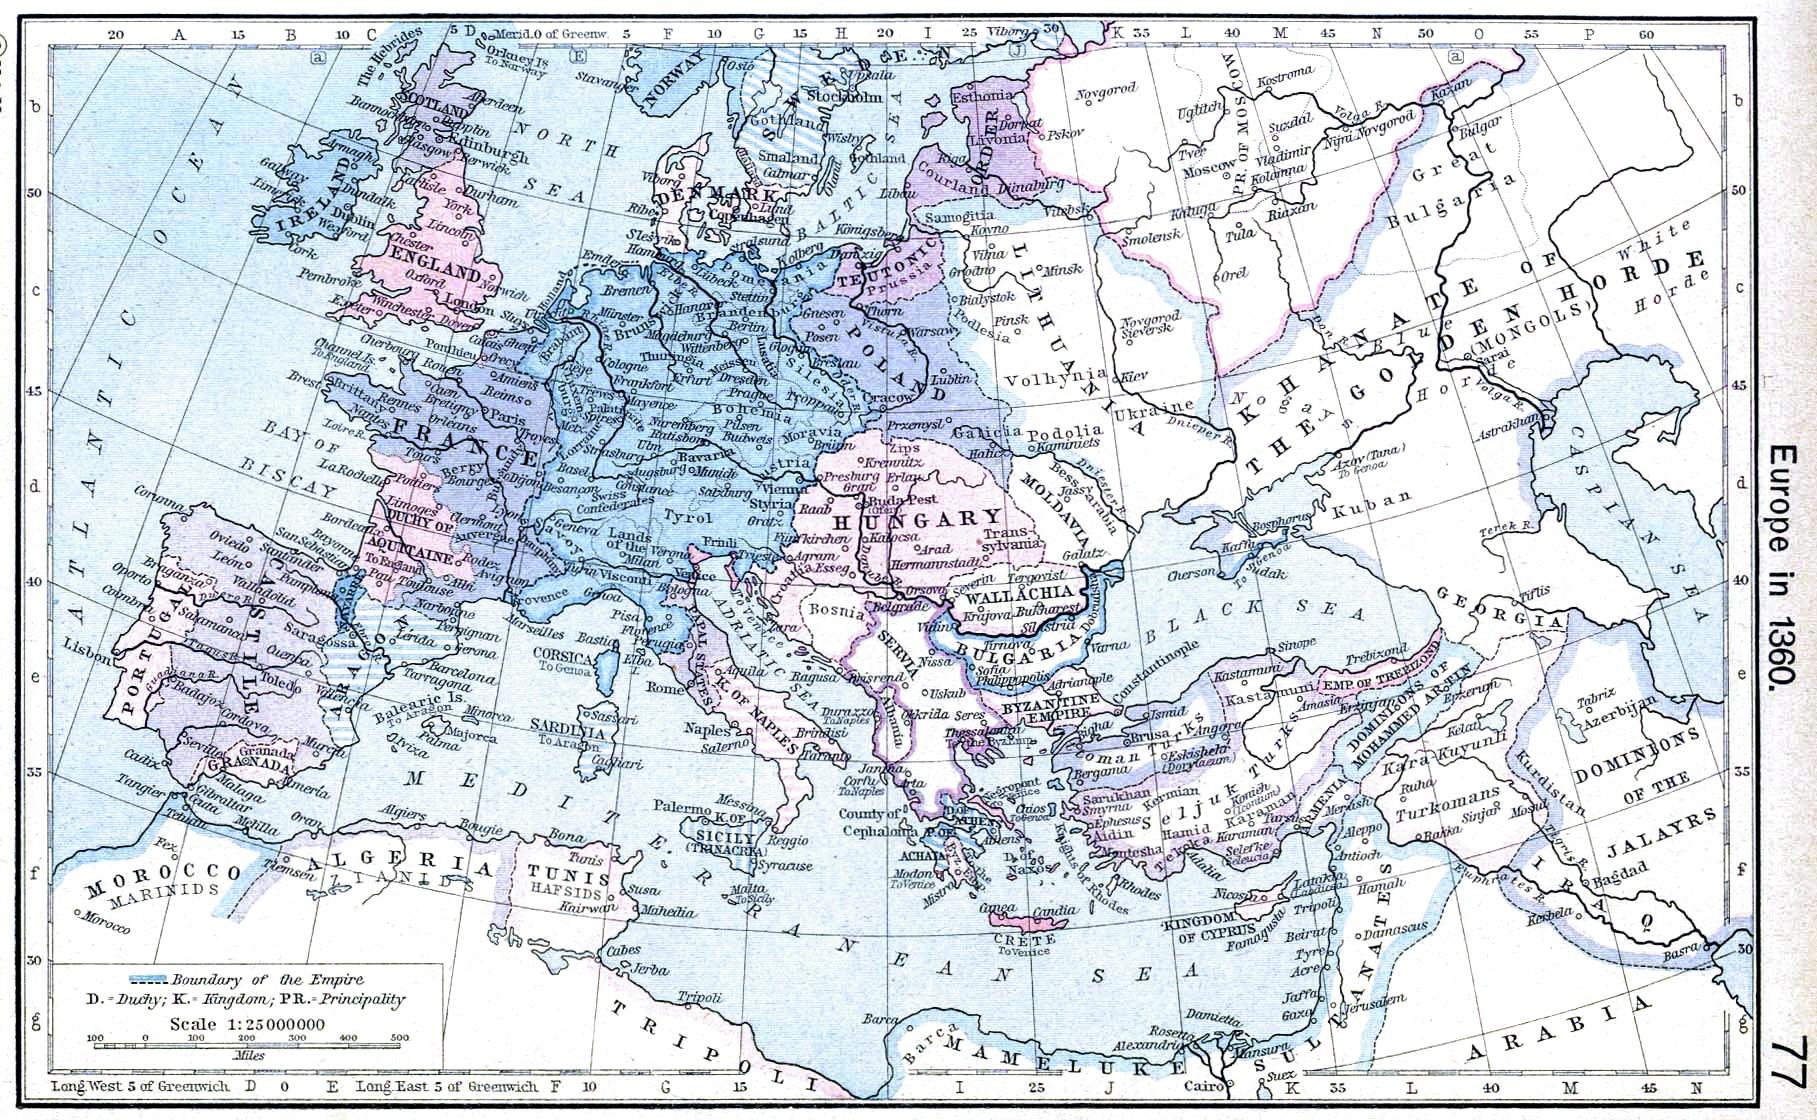 File:Europe 1360.jpg